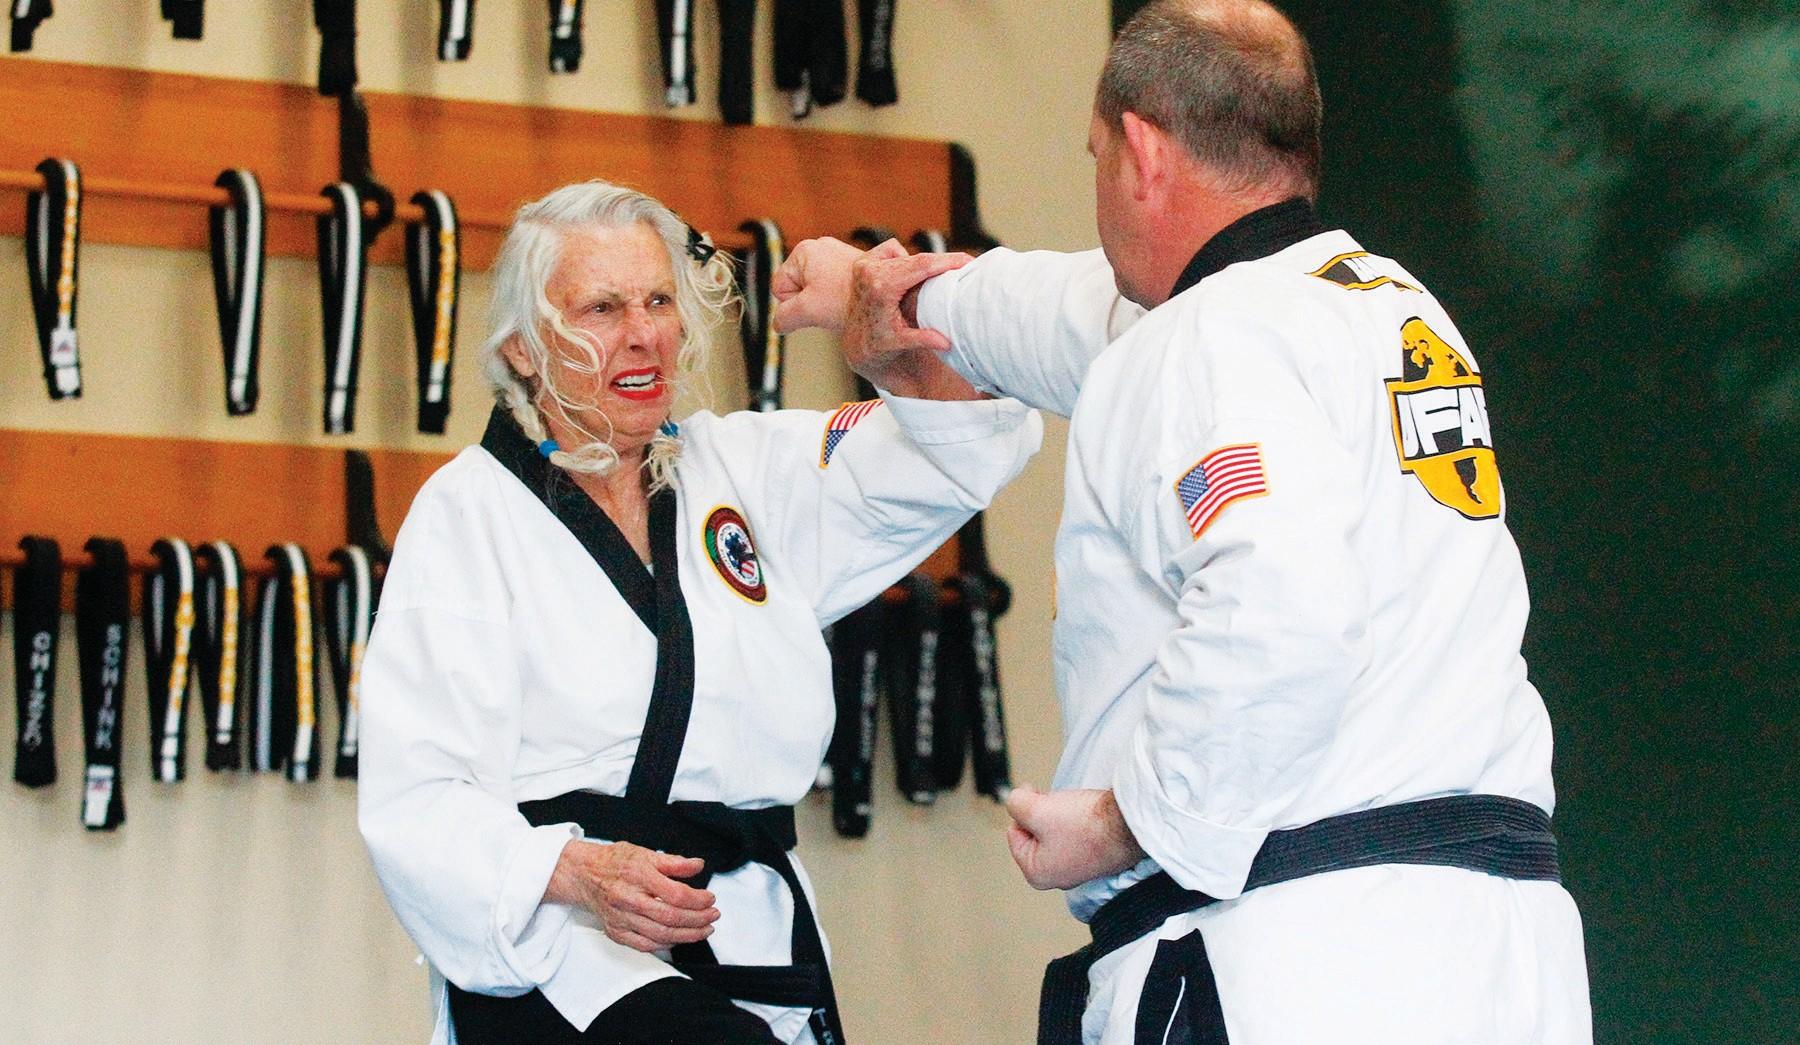 FIGHTING SPIRIT—Gale Trumbeaux, who turns 80 years old on Dec. 20, spars with Jeffery Barber during her third-degree black-belt test on Dec. 6 at Premier Martial Arts in Westlake Village. RICHARD GILLARD/Acorn Newspapers